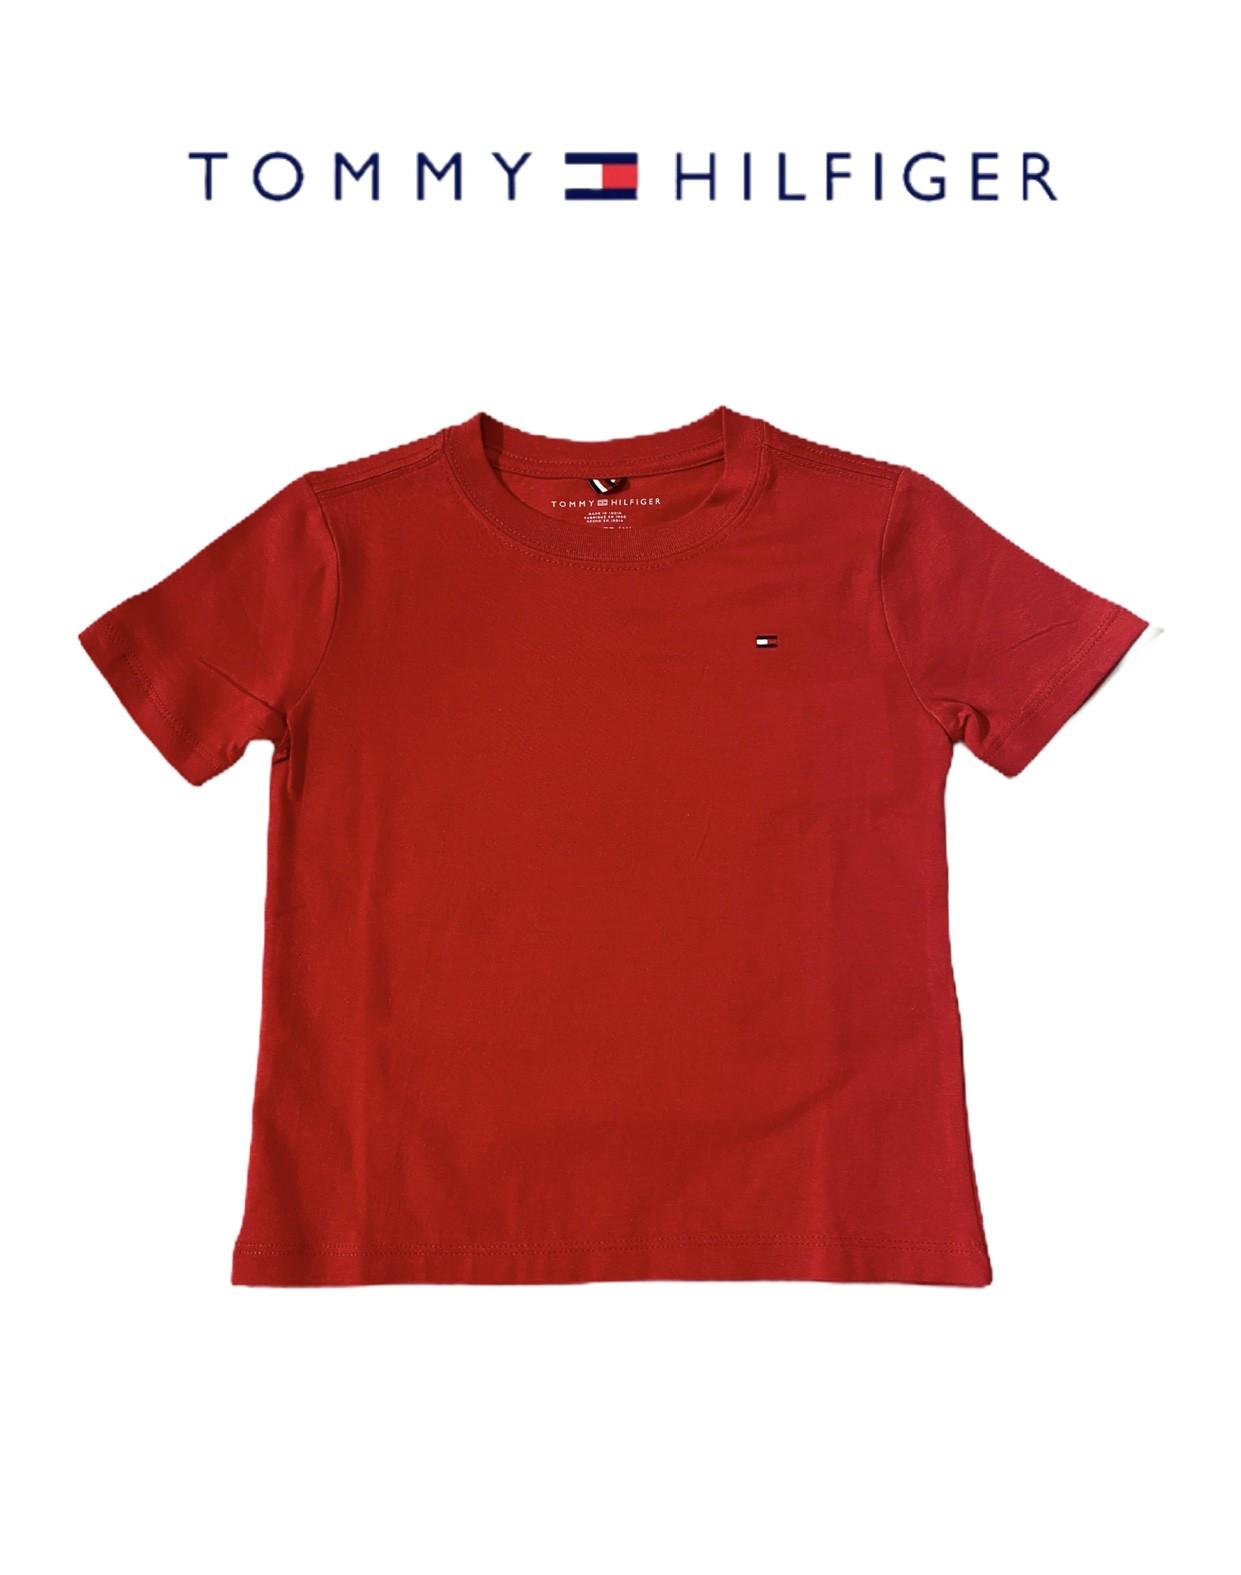 CAMISETA TOMMY HILFIGER® VERMELHA